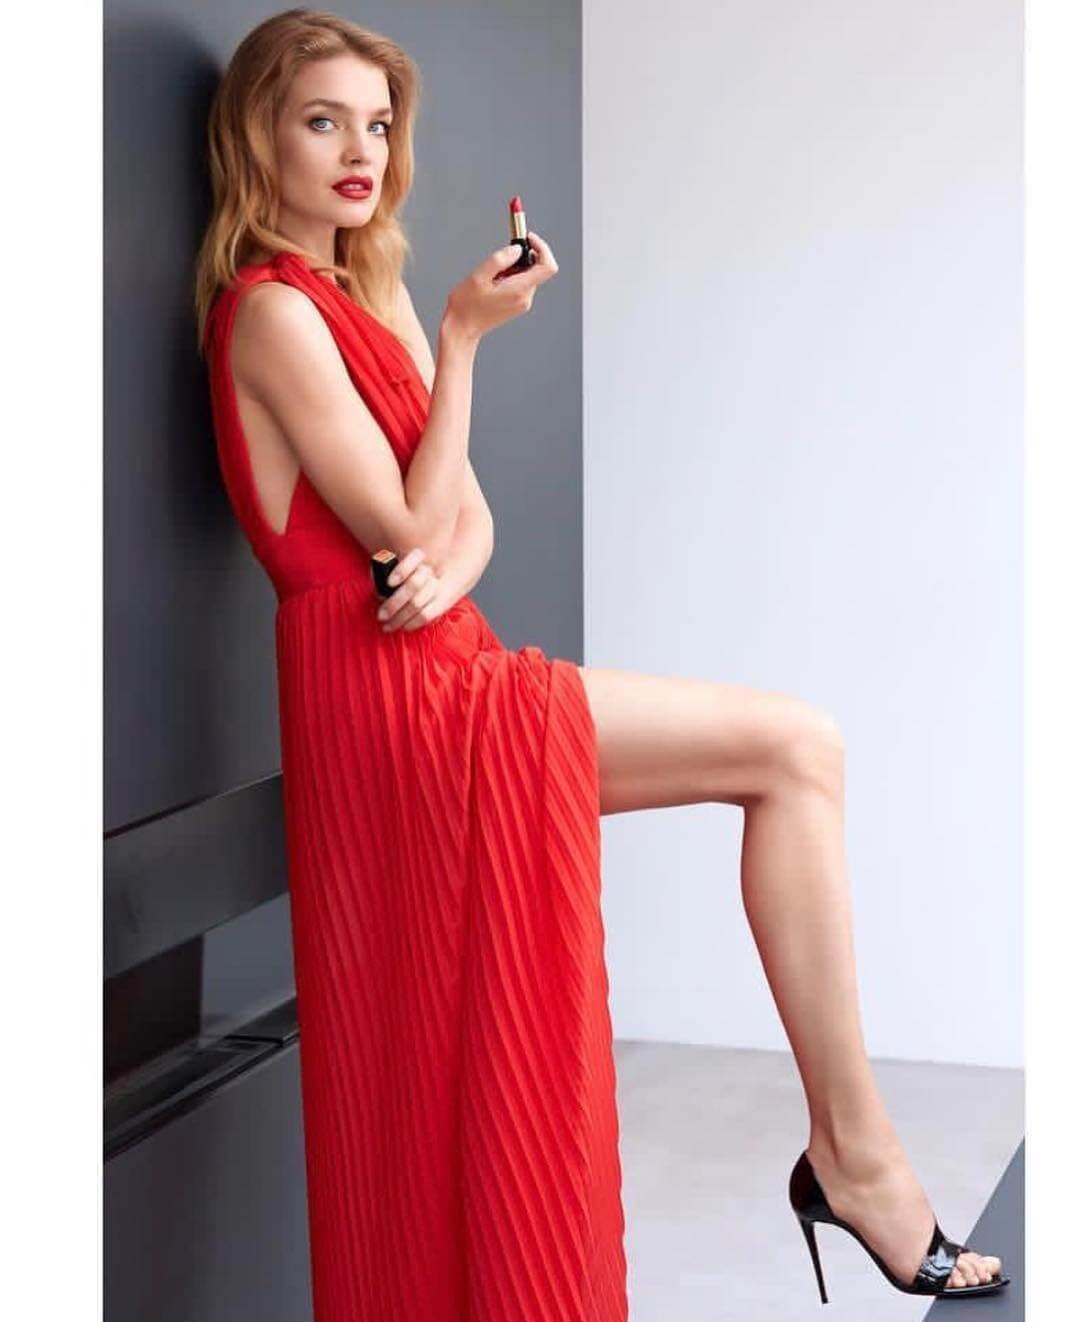 Natalia Vodianova sexy feet